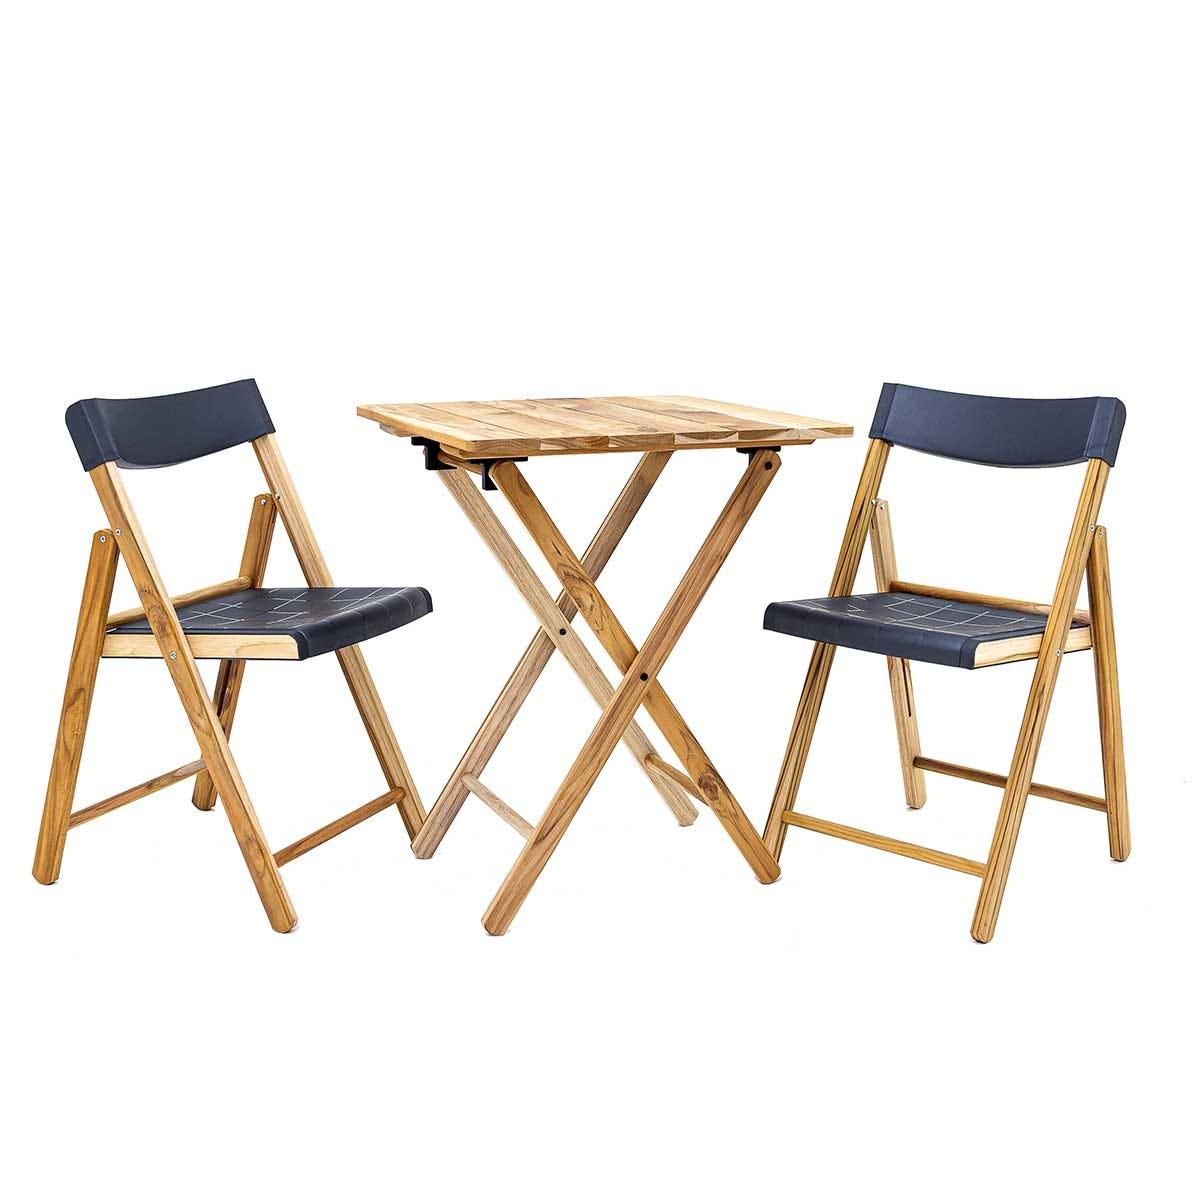 Tramontina 3 Piece Folding Bistro Set with Grey Seats